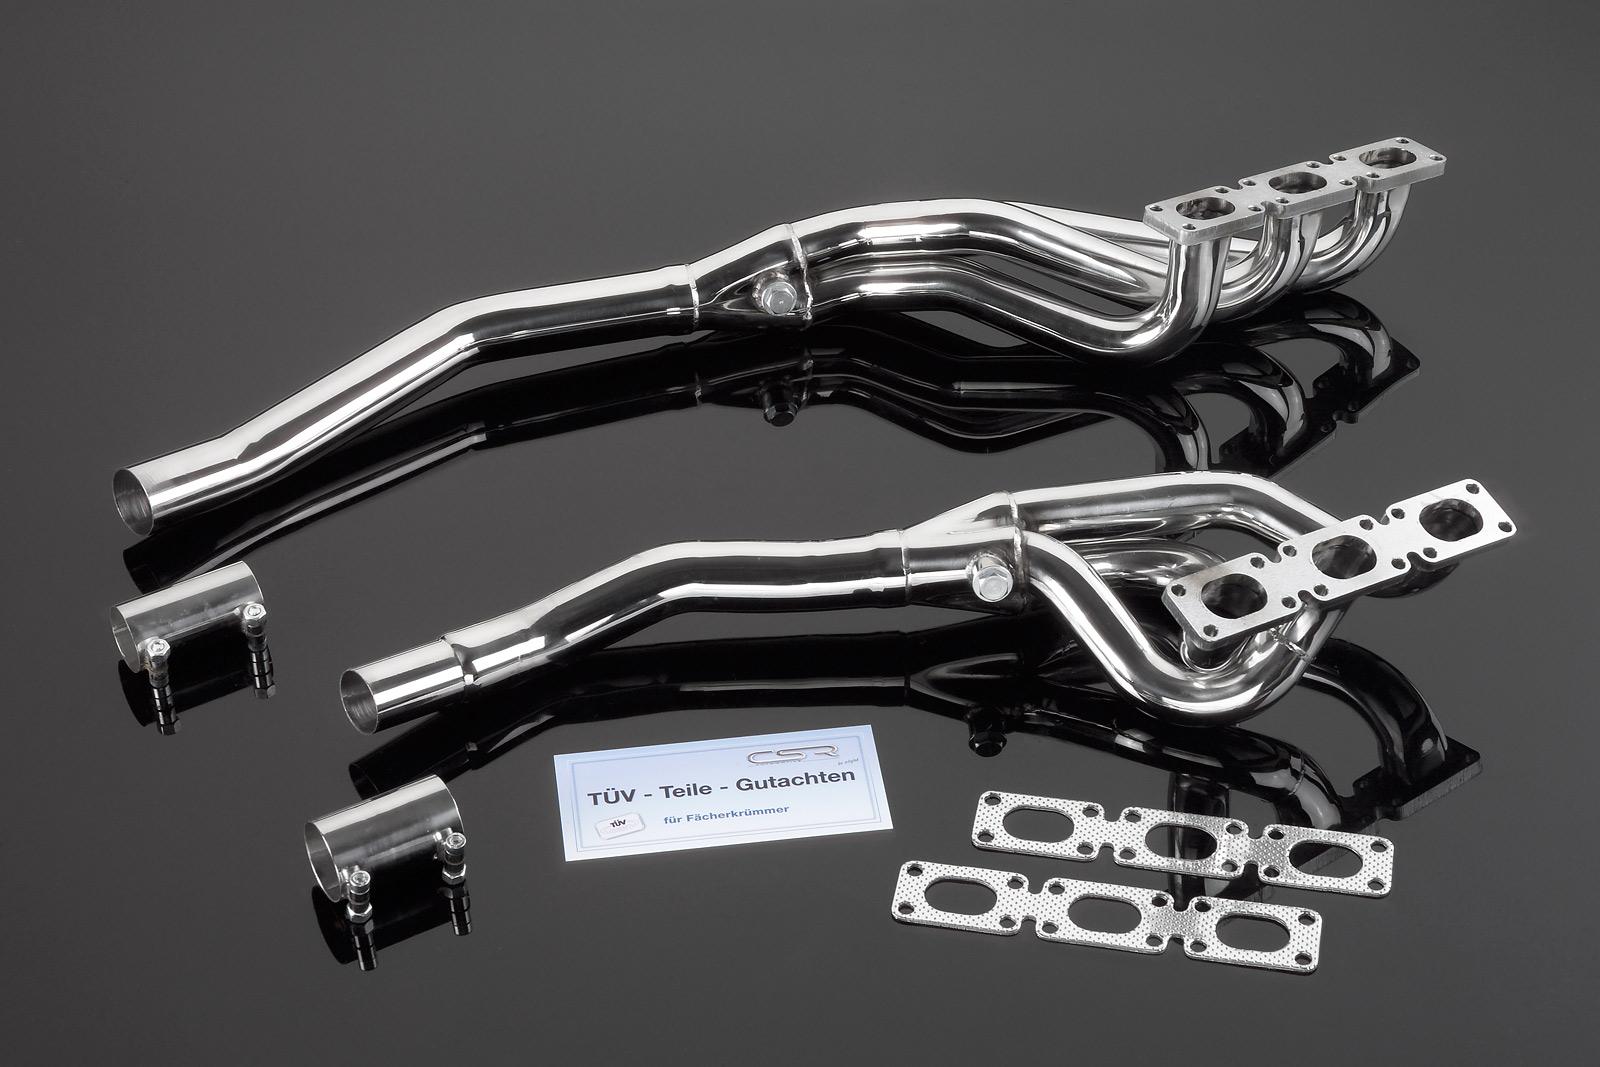 werbeagentur-focus-nuernberg-produktfotografie-csr-automotive-01